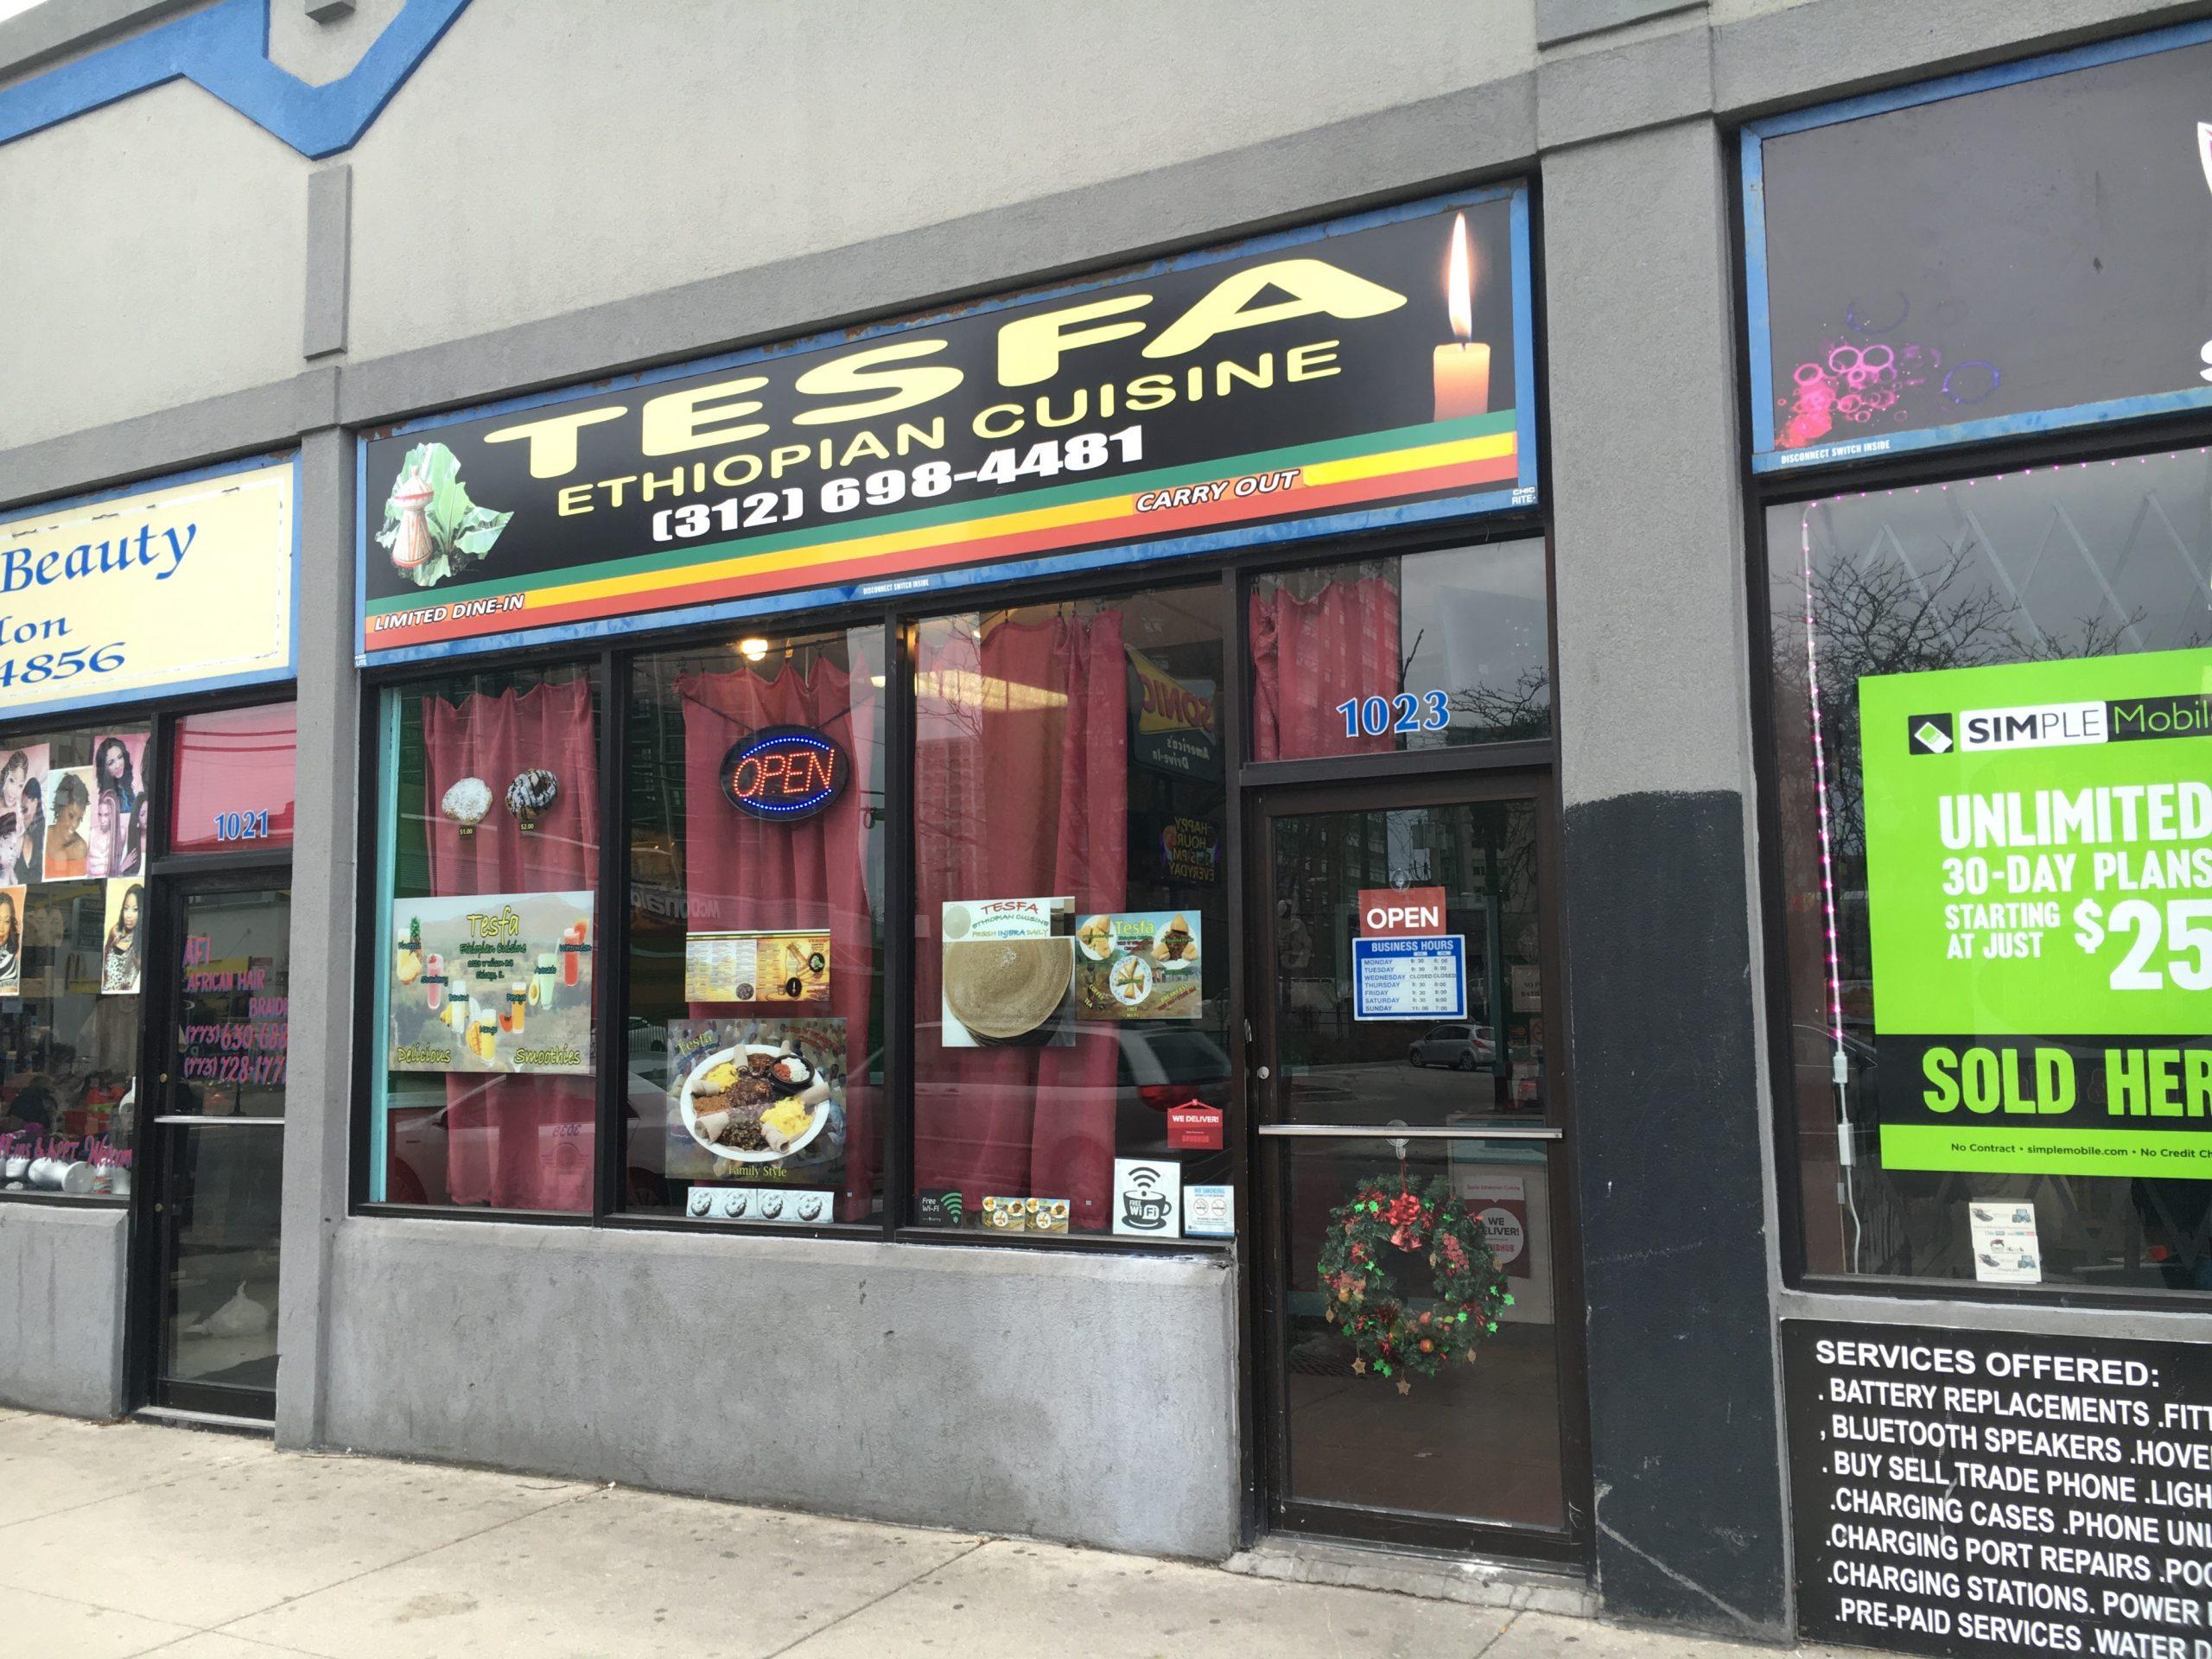 Tesfa Ethiopian Cuisine in Uptown